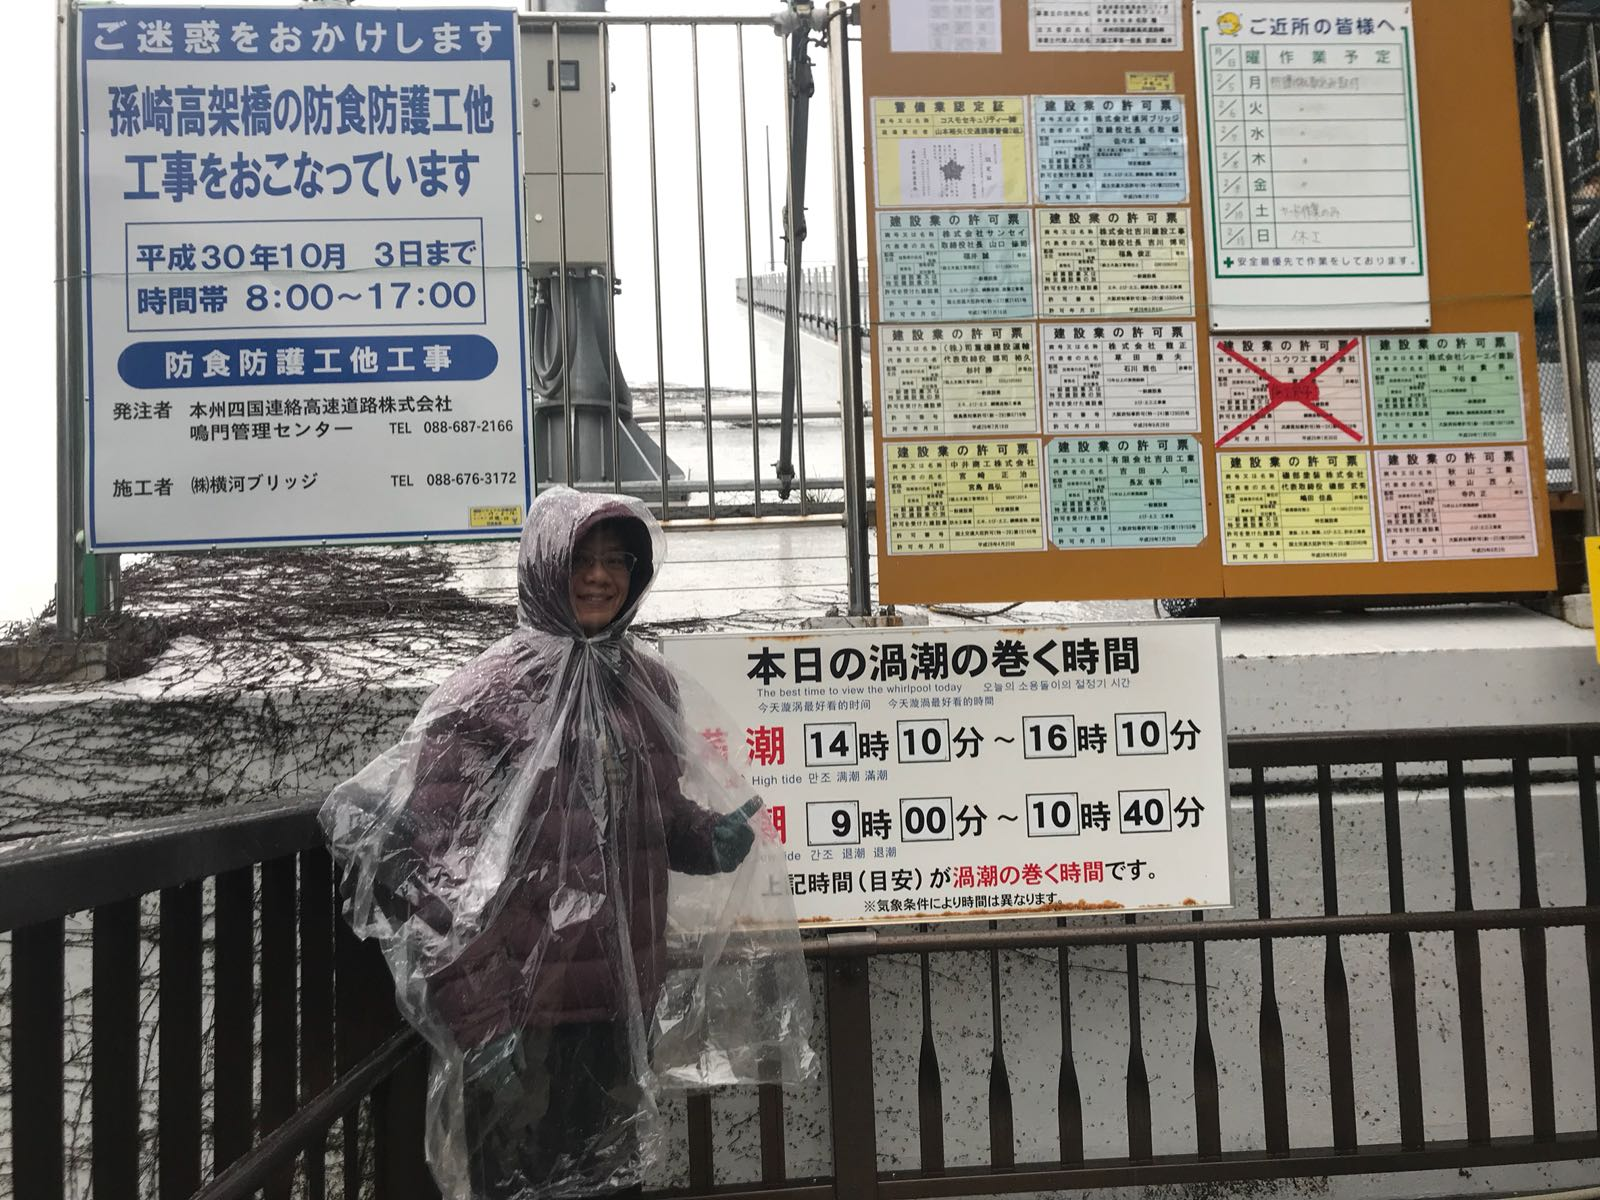 2018-02-20-PHOTO-00000826.jpg